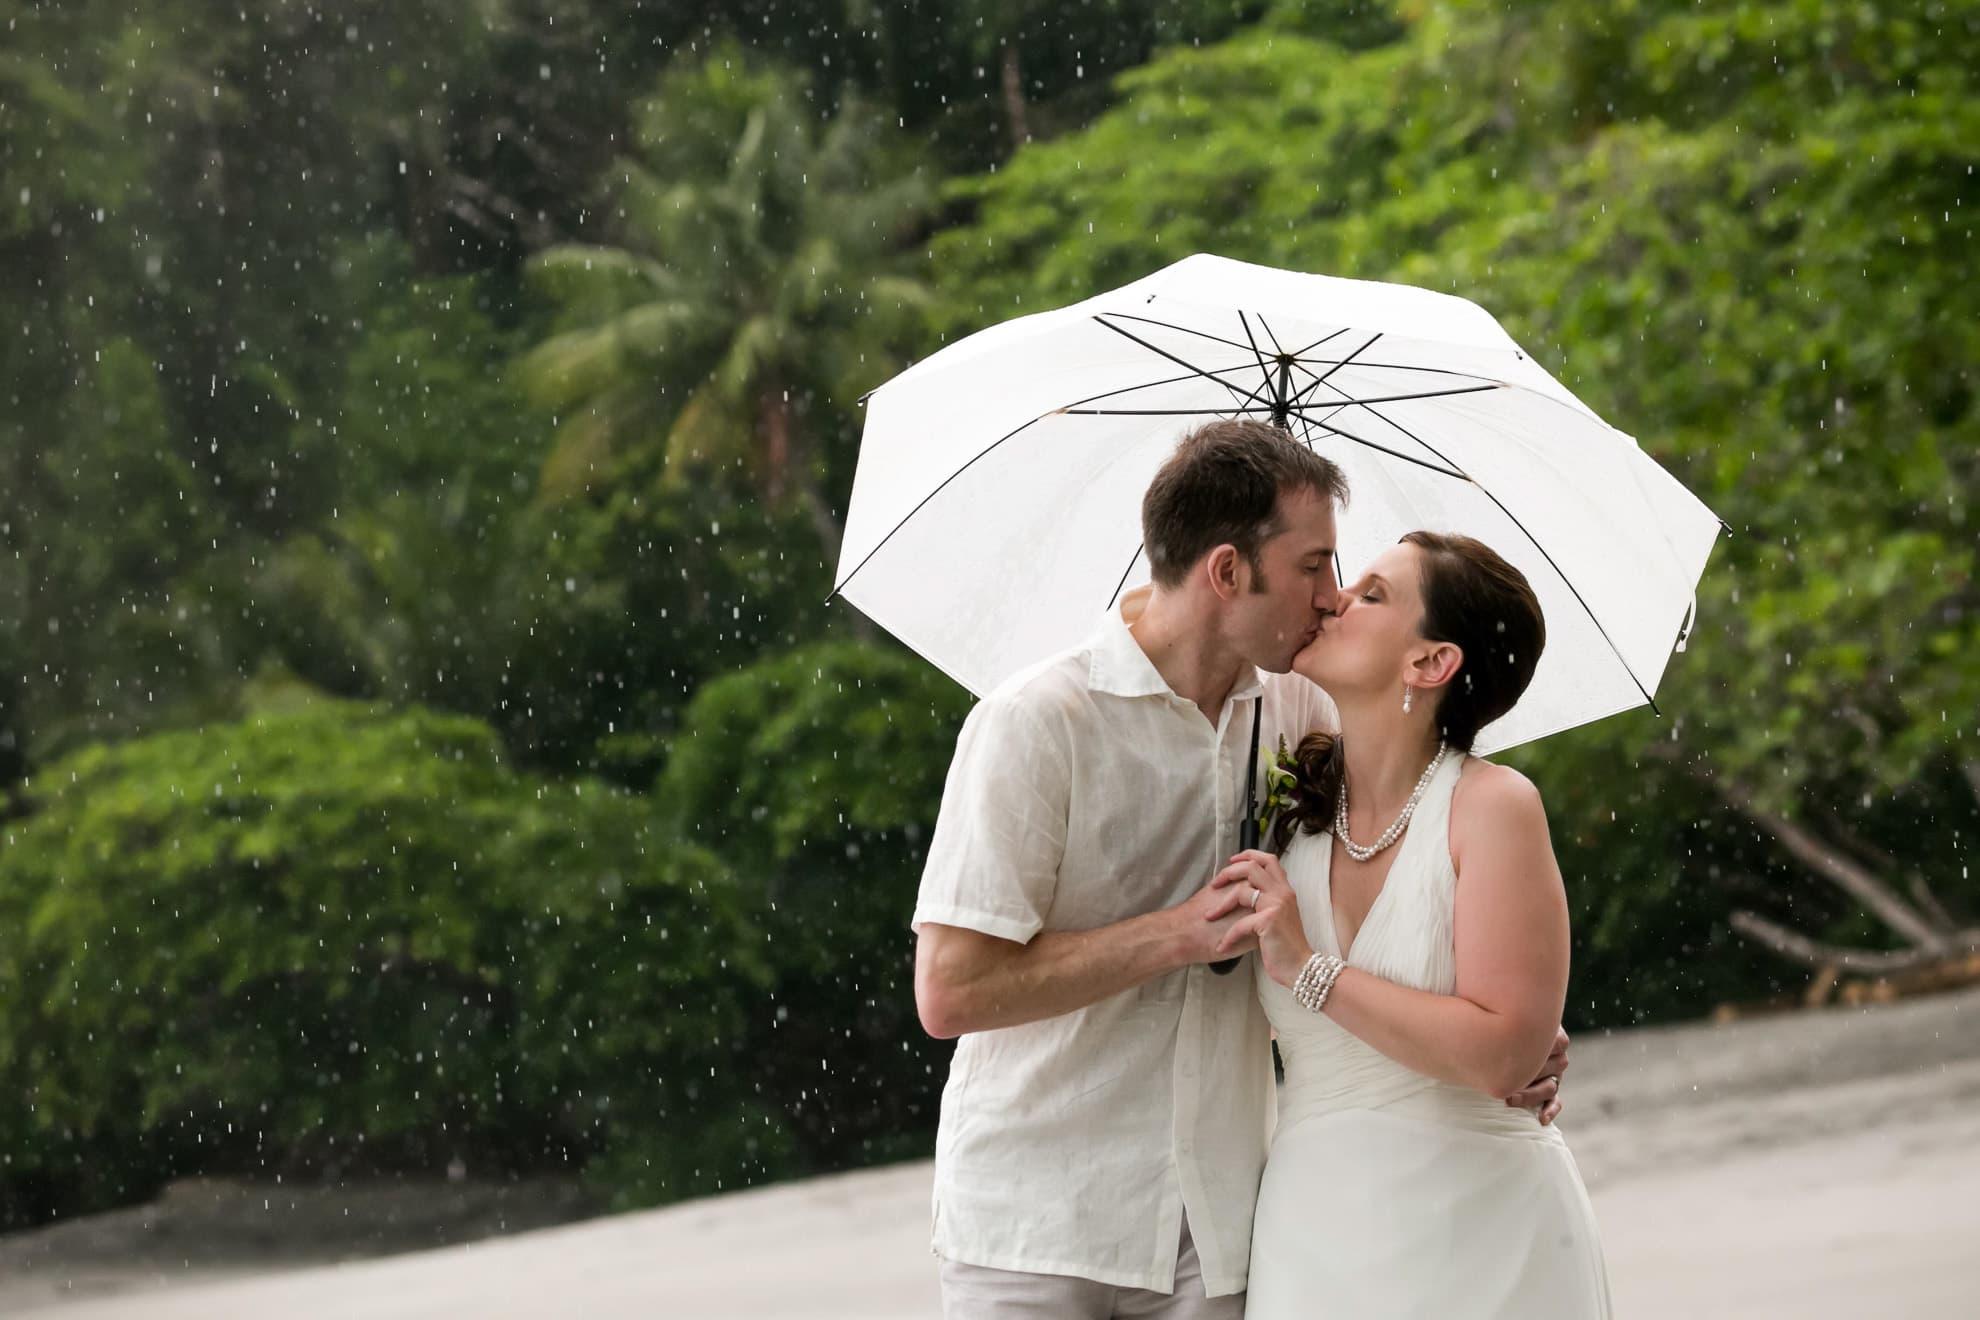 Wedding in the rain in Costa Rica.